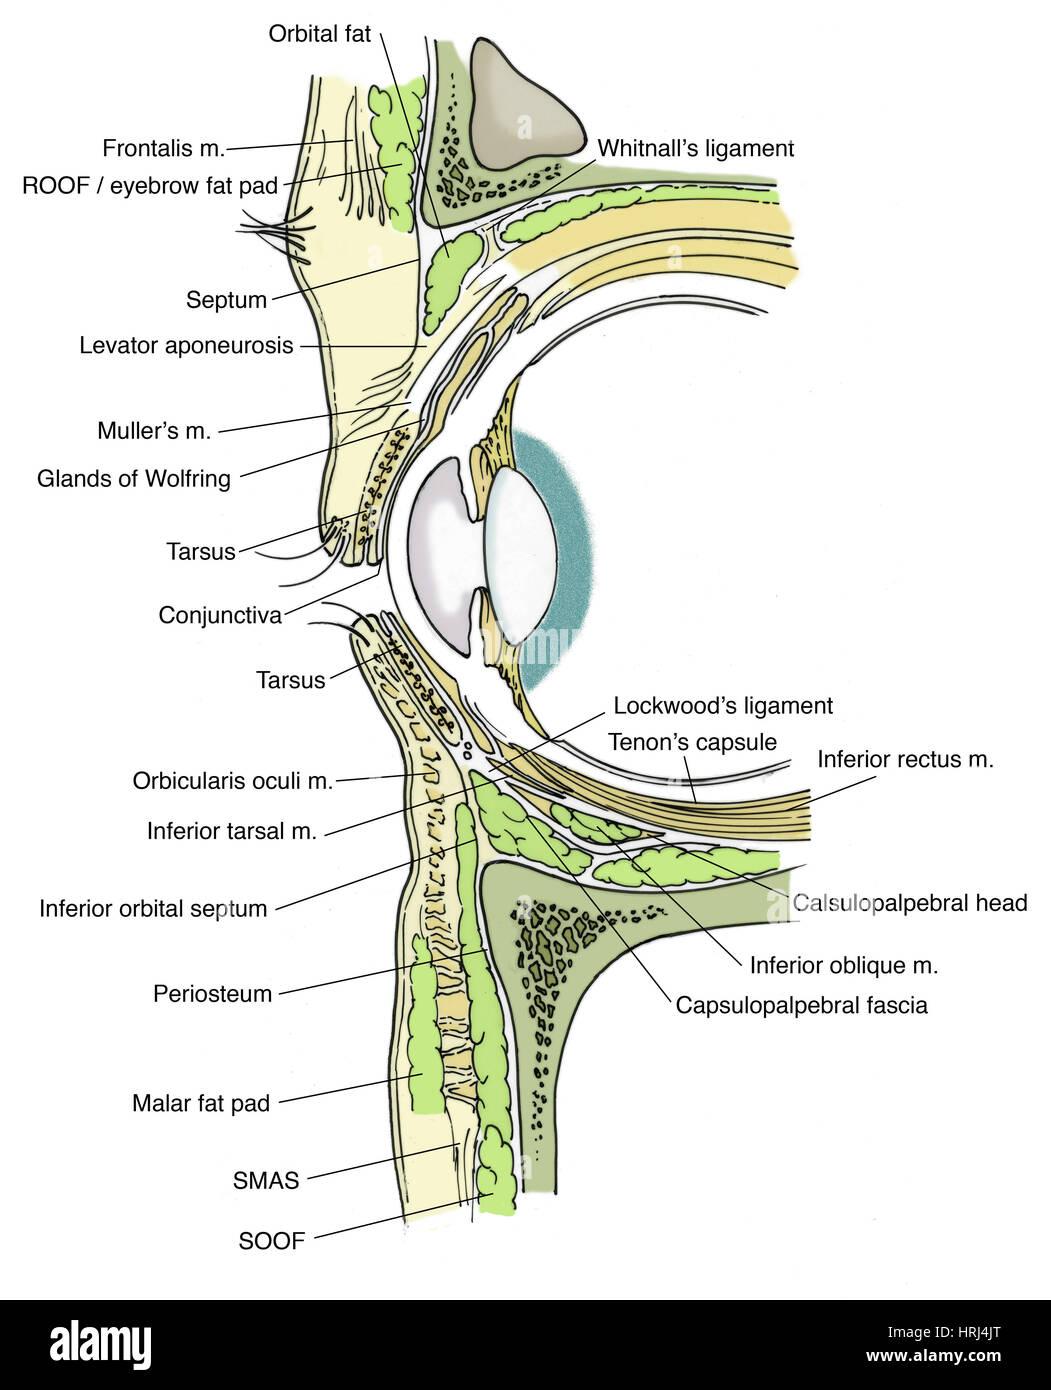 Illustration of Eye Anatomy Stock Photo: 135008464 - Alamy